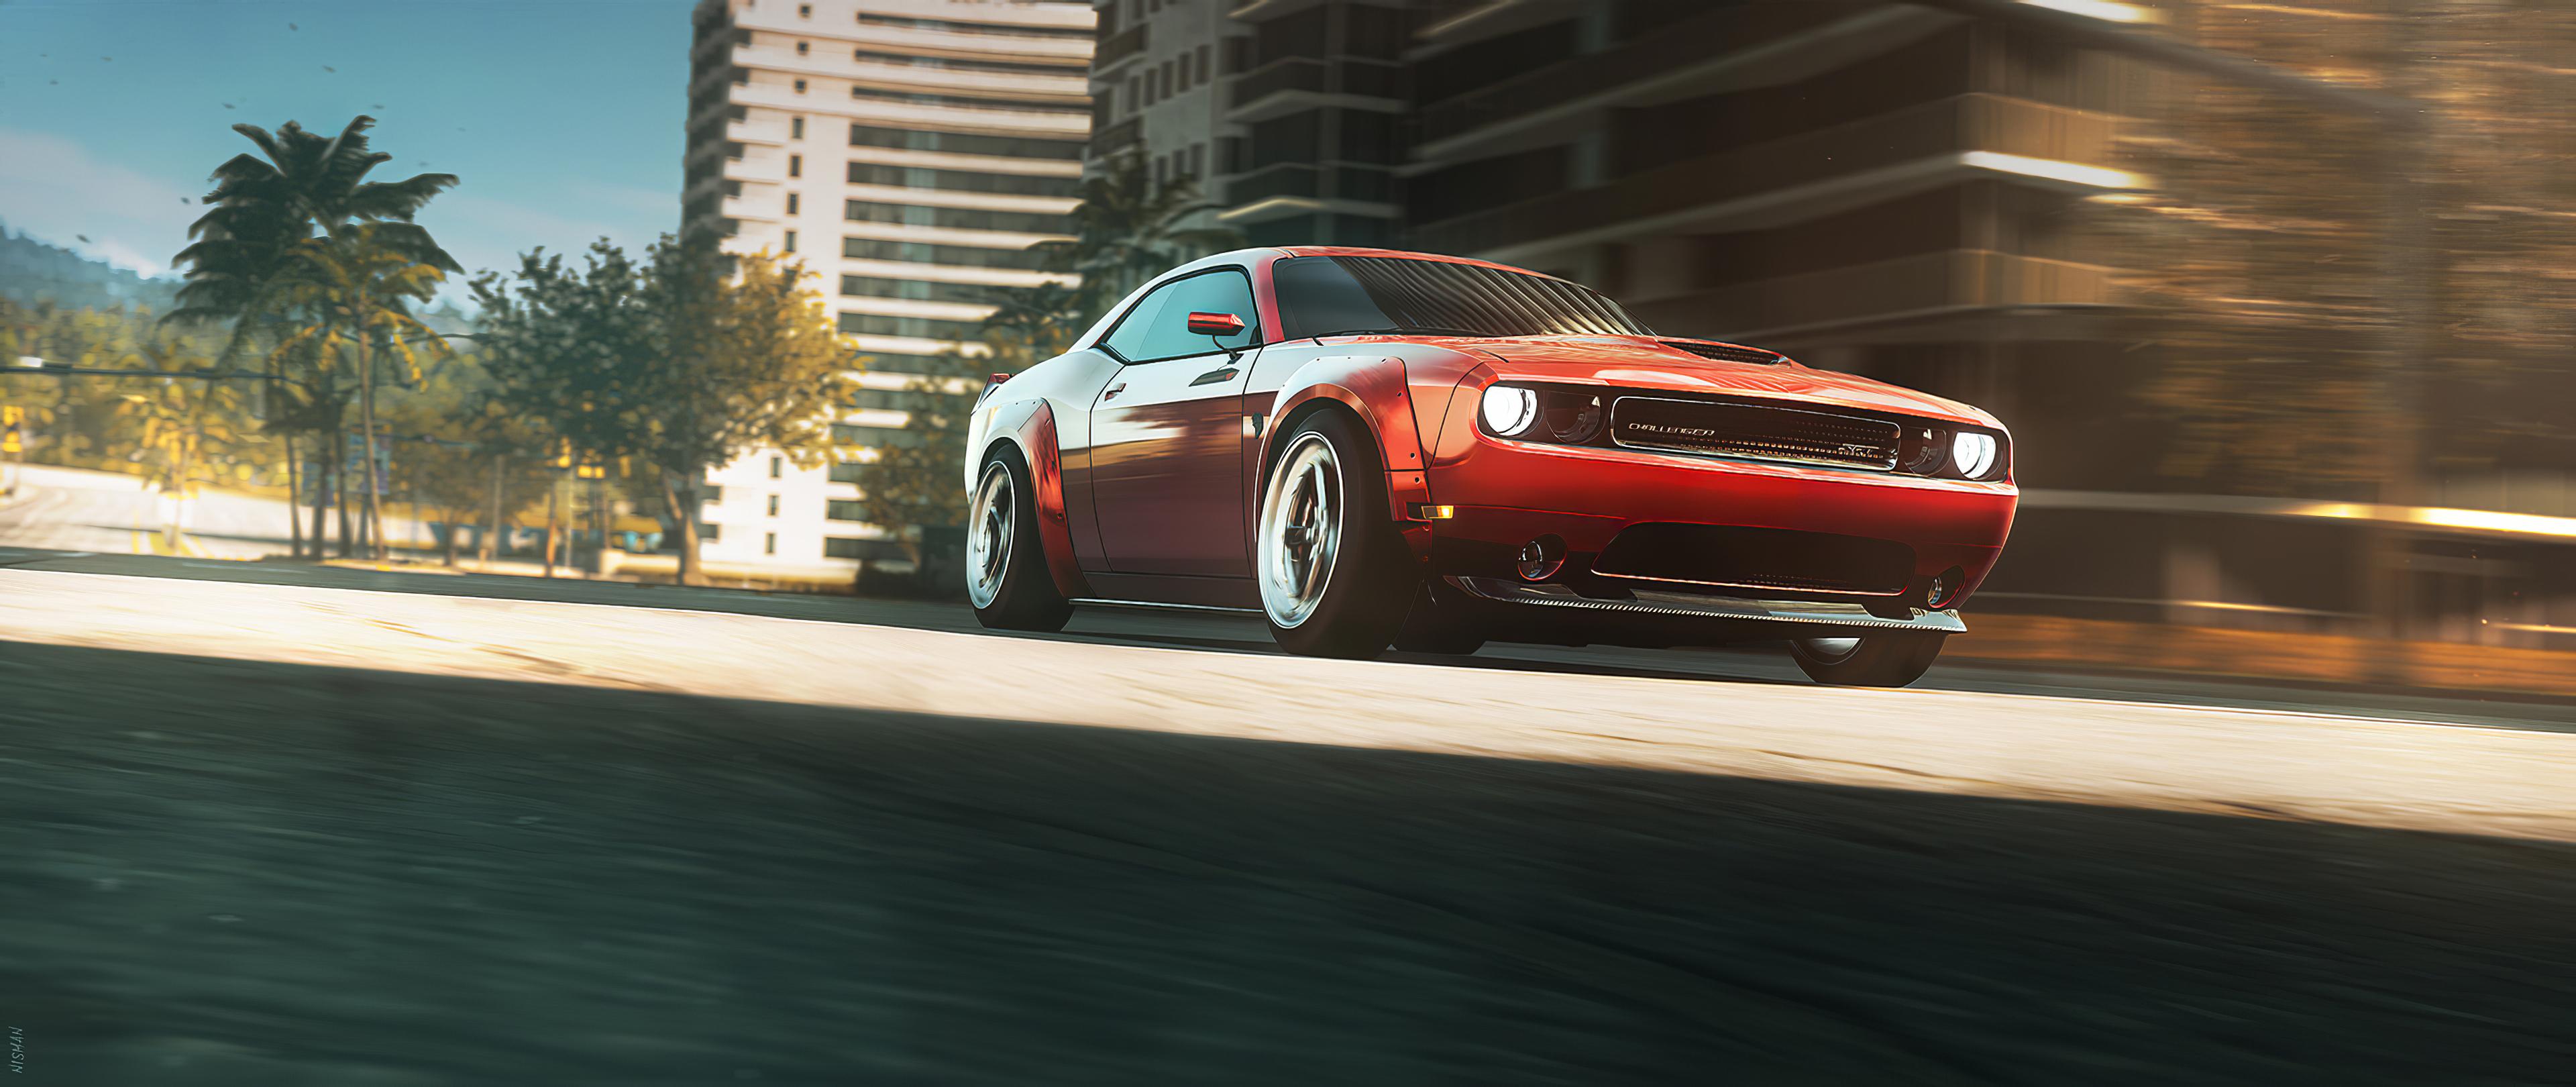 dodge challenger need for speed heat 1578853923 - Dodge Challenger Need For Speed Heat - Dodge Challenger Need For Speed Heat 4k wallpaper